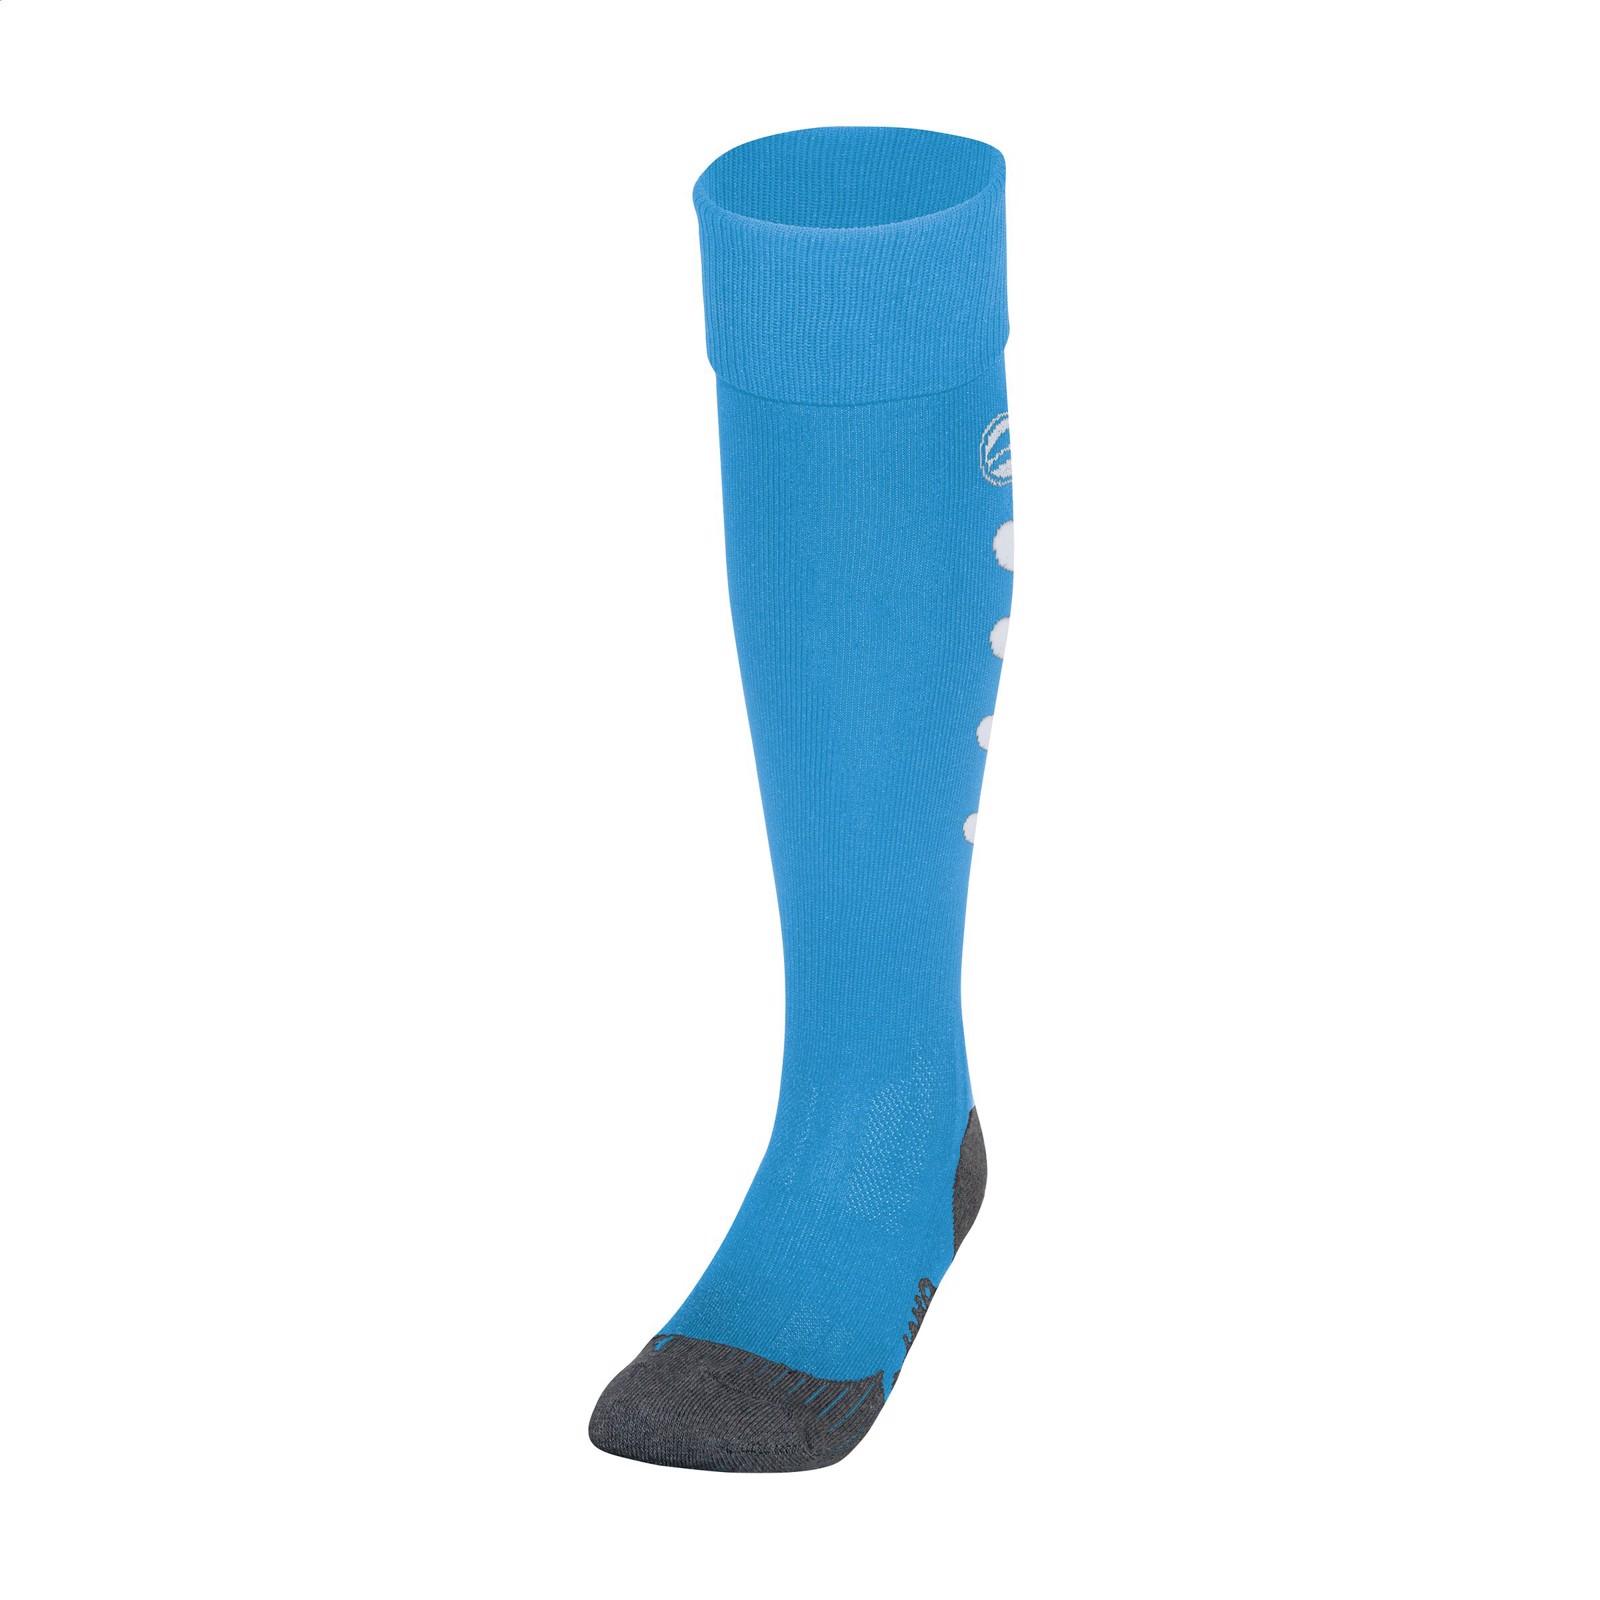 Jako® Roma Sport Socks - Turquoise / XS